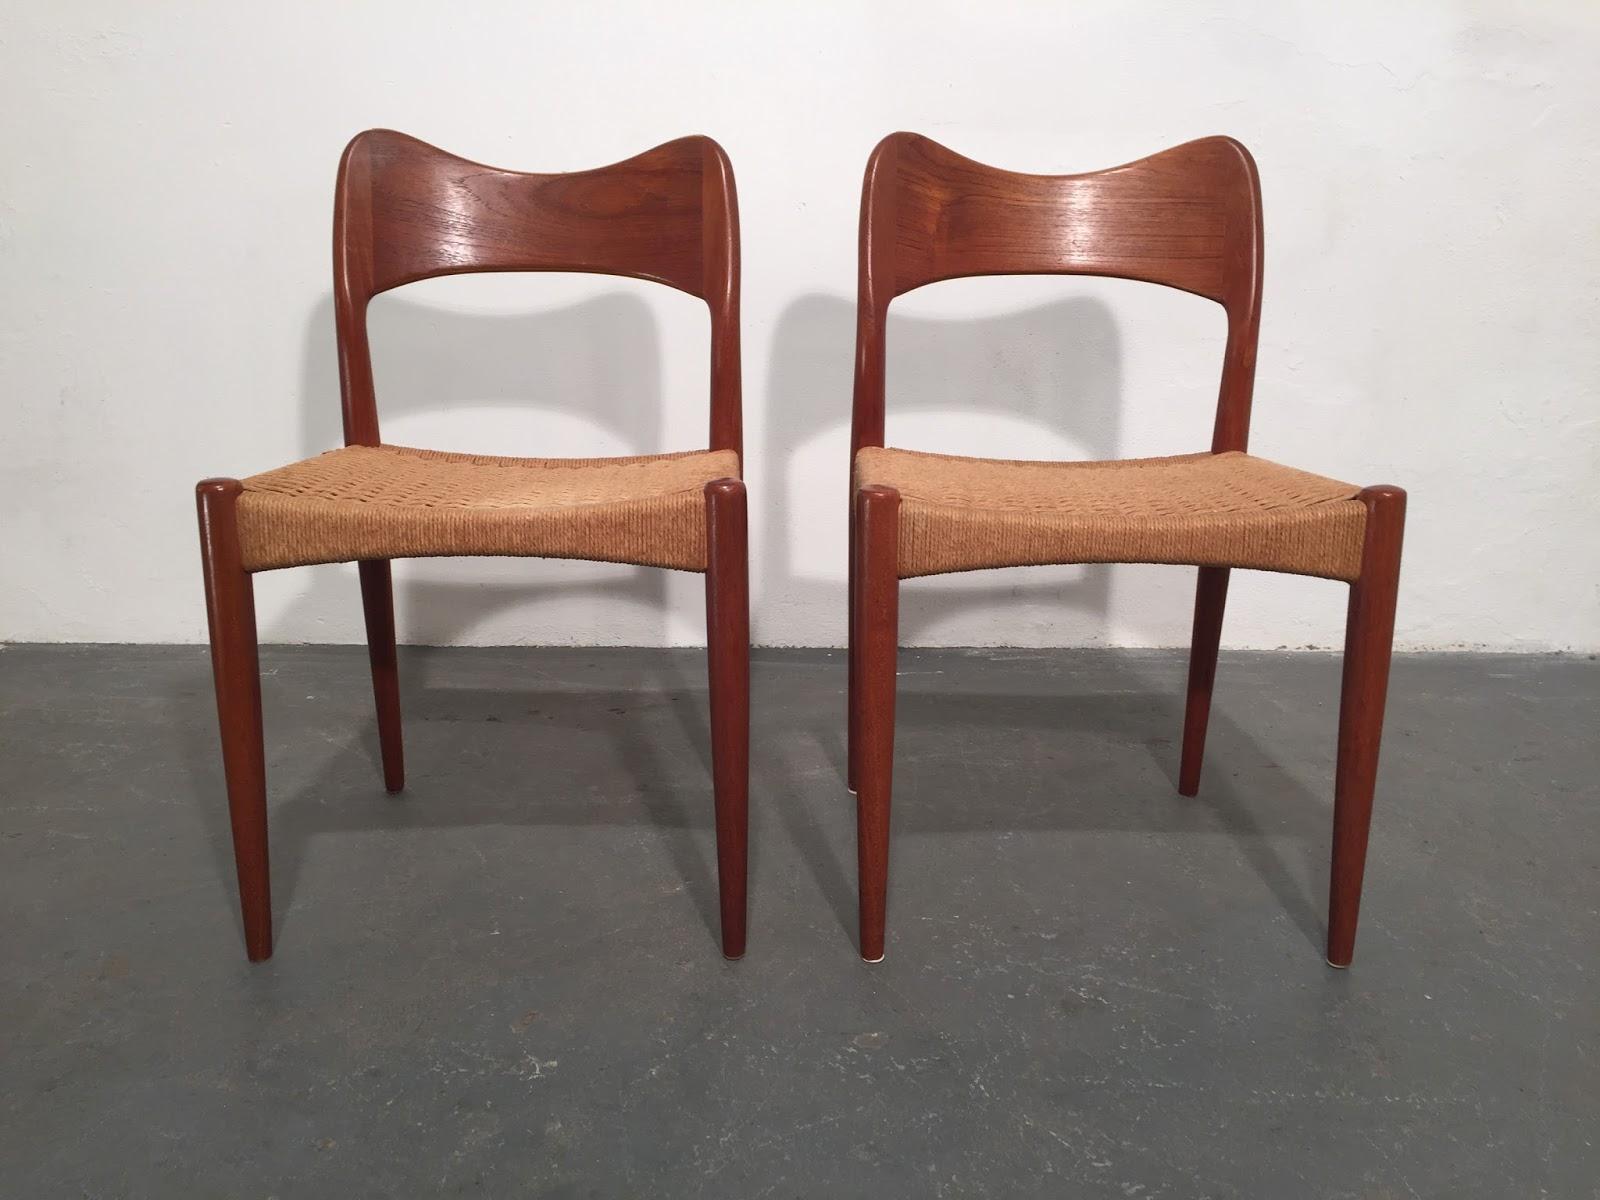 Ocd vintage furniture ireland arne hovmand olsen for Furniture ireland